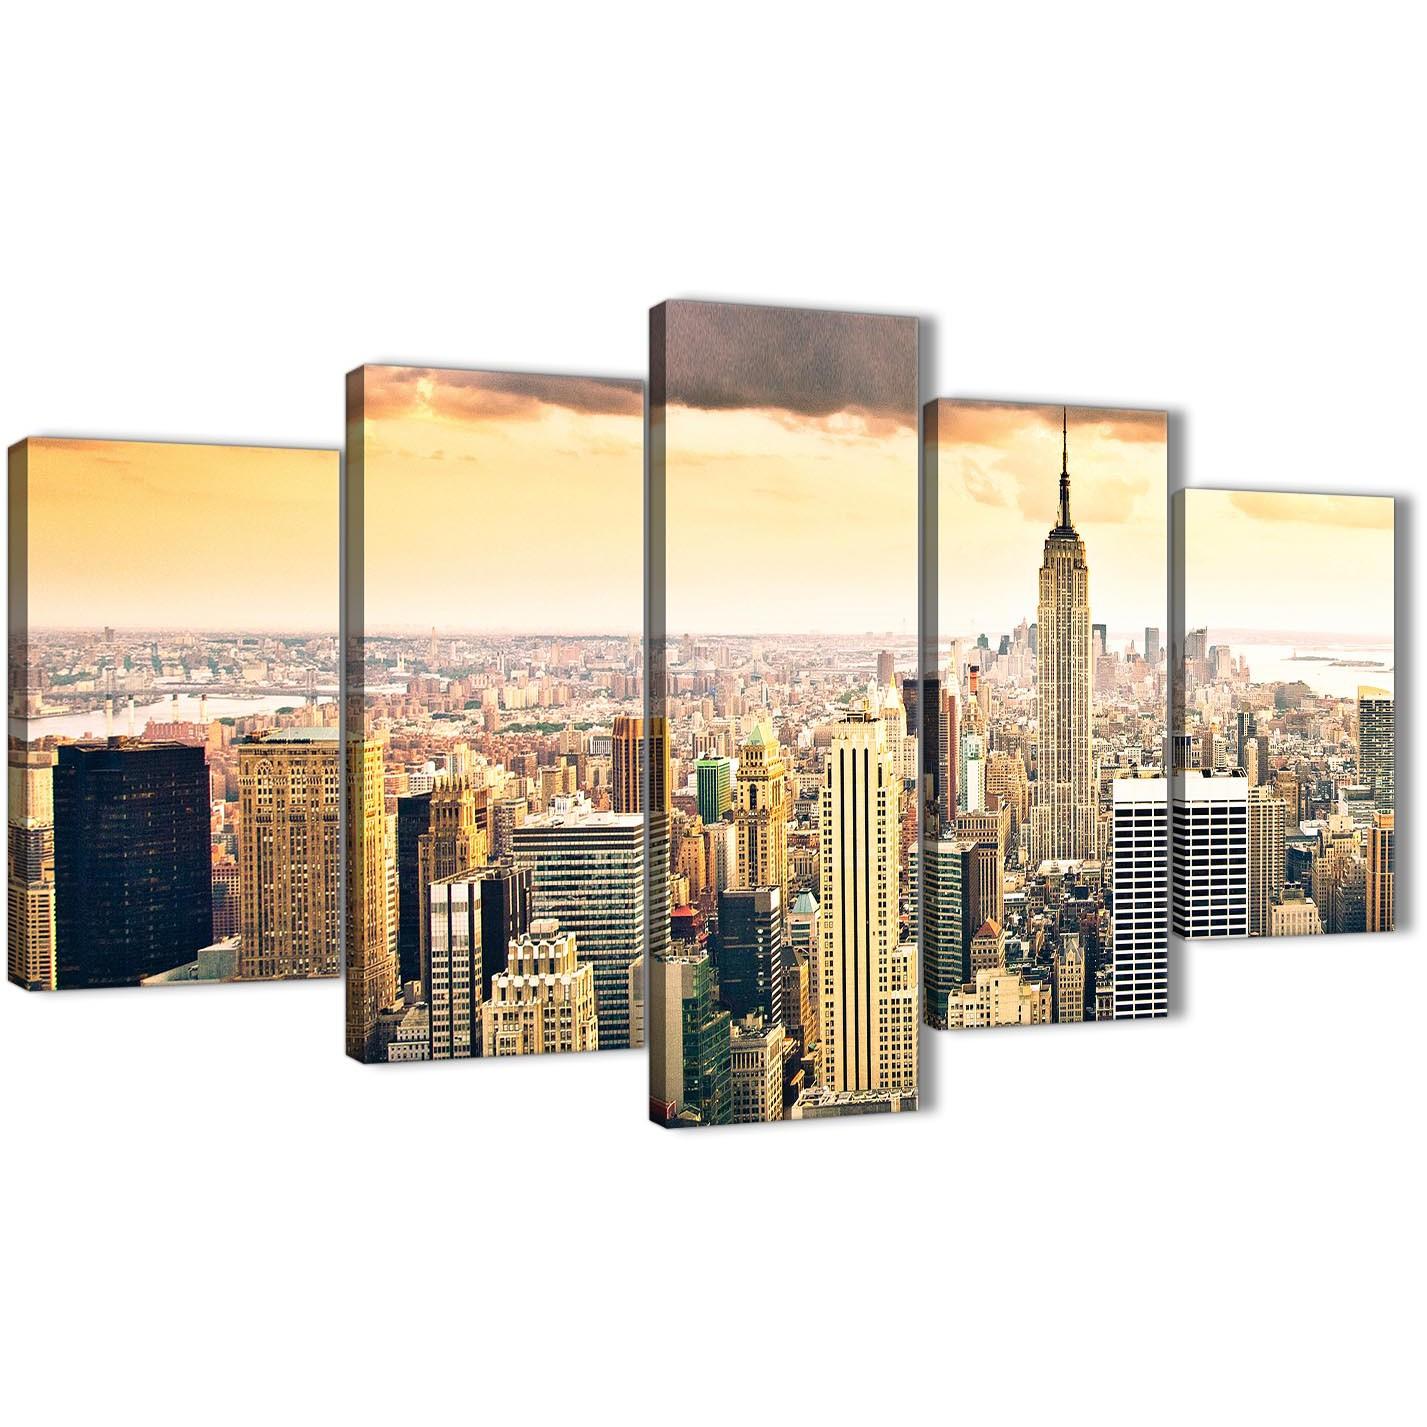 New York Nyc Skyline City Single Canvas Wall Art Picture: 5 Piece New York Manhattan Skyline Yellow Grey City